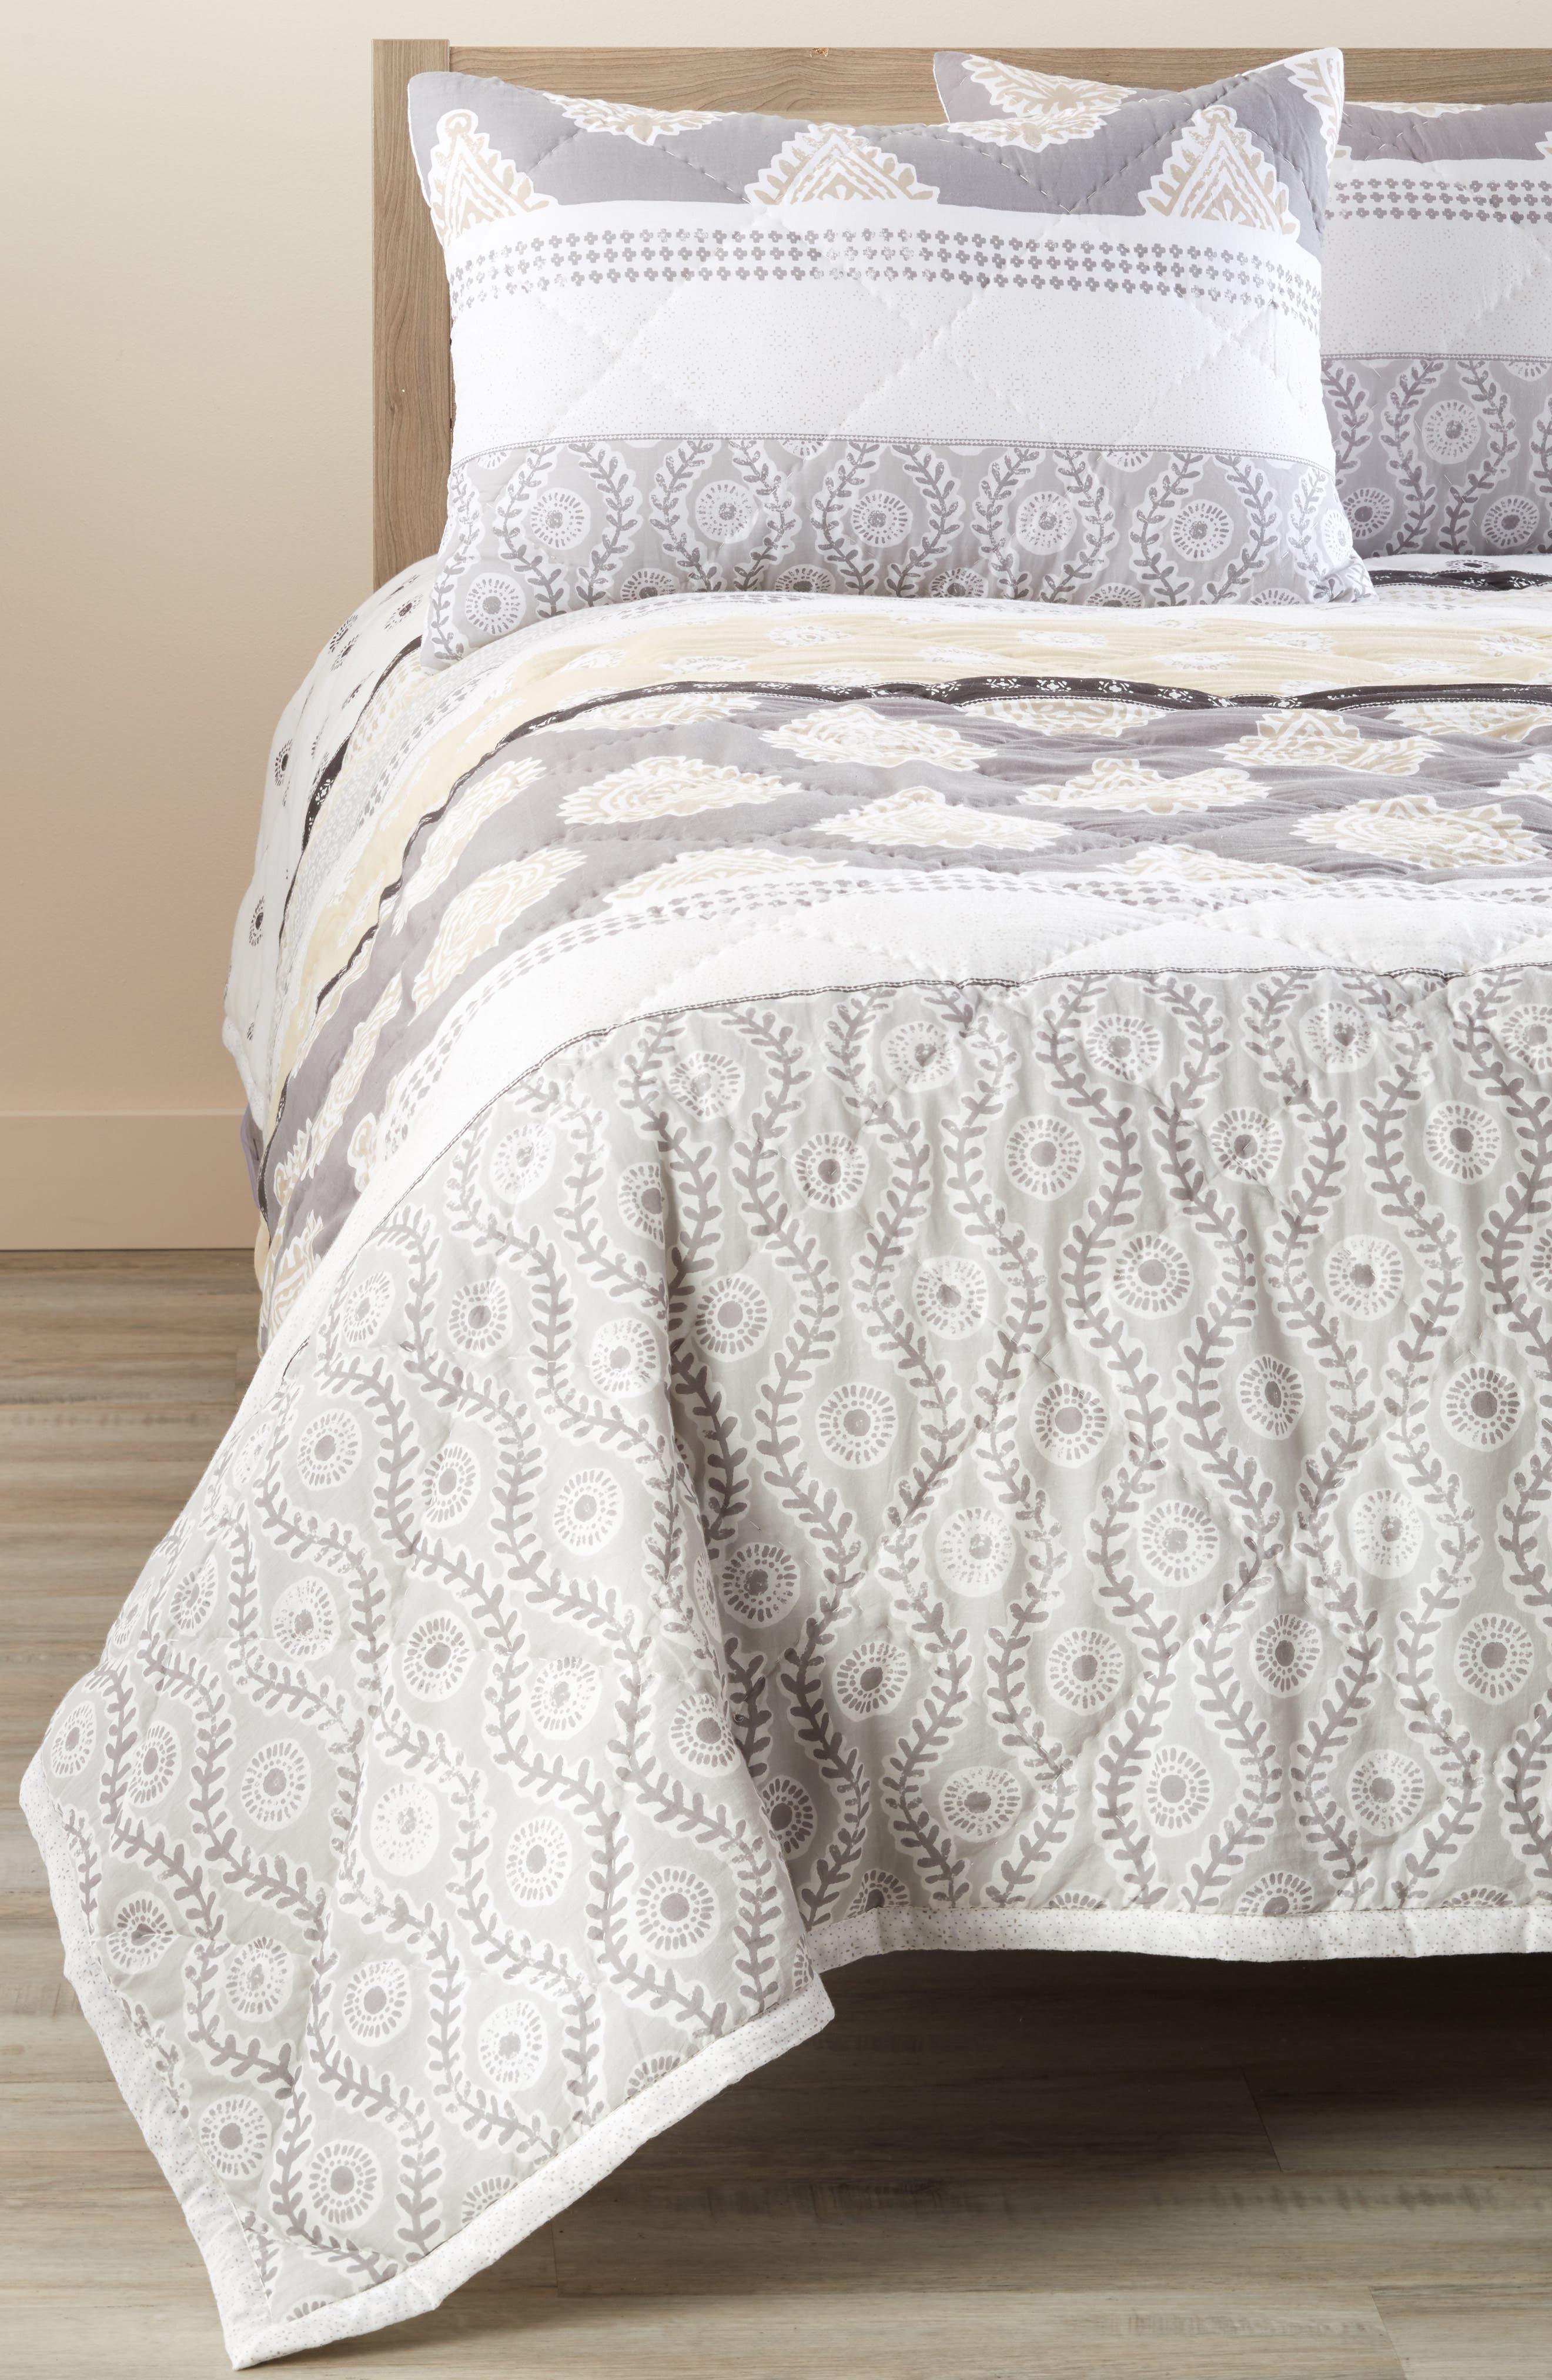 Nordstrom At Home Block Print Comforter